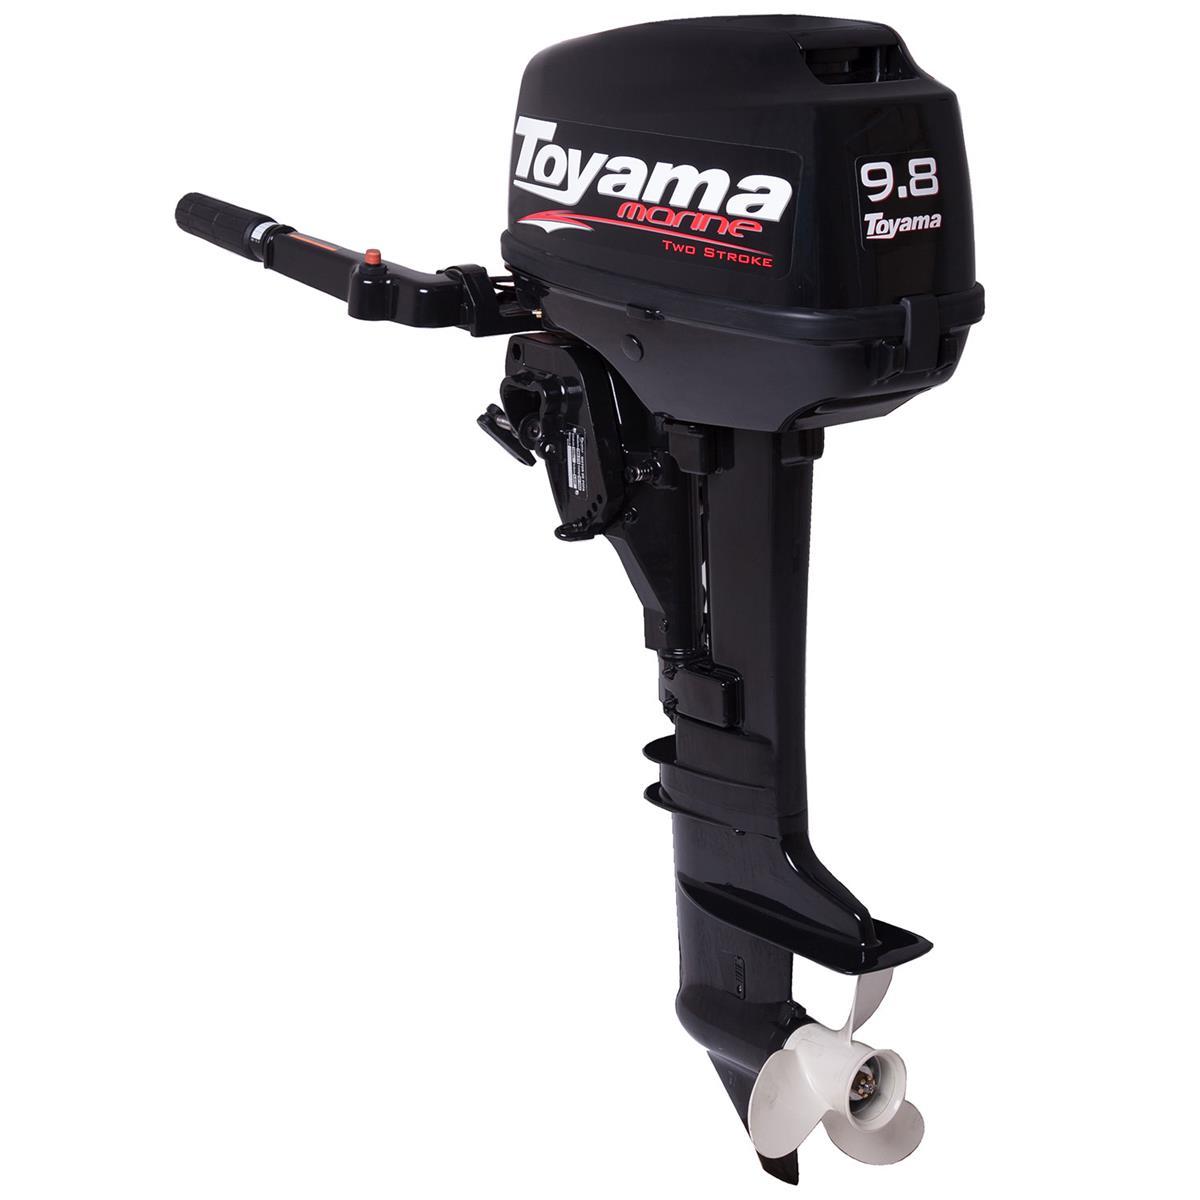 Motor De Popa Bicilíndrico 169Cc 2 Tempos Tm98ts Toyama